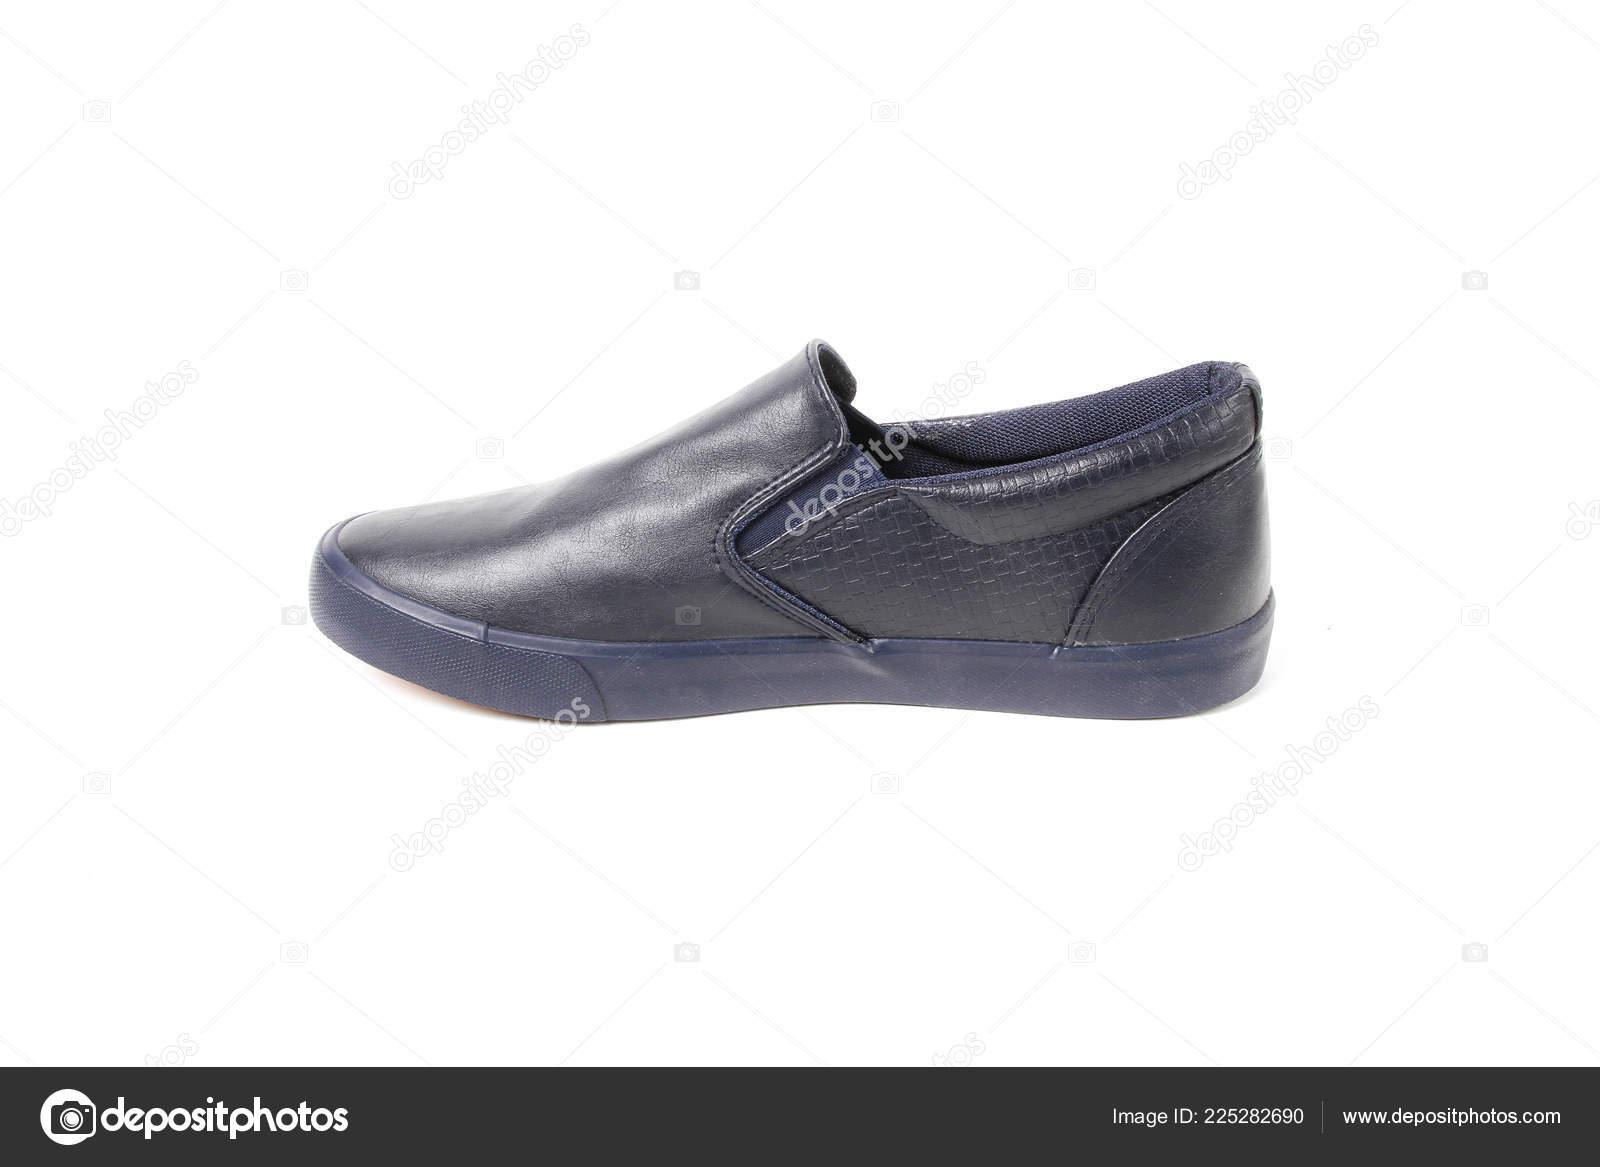 d05e25b47f Zapatos Hombre Causal Elegantes Sobre Fondo Blanco Pic Foto Agradable —  Foto de Stock